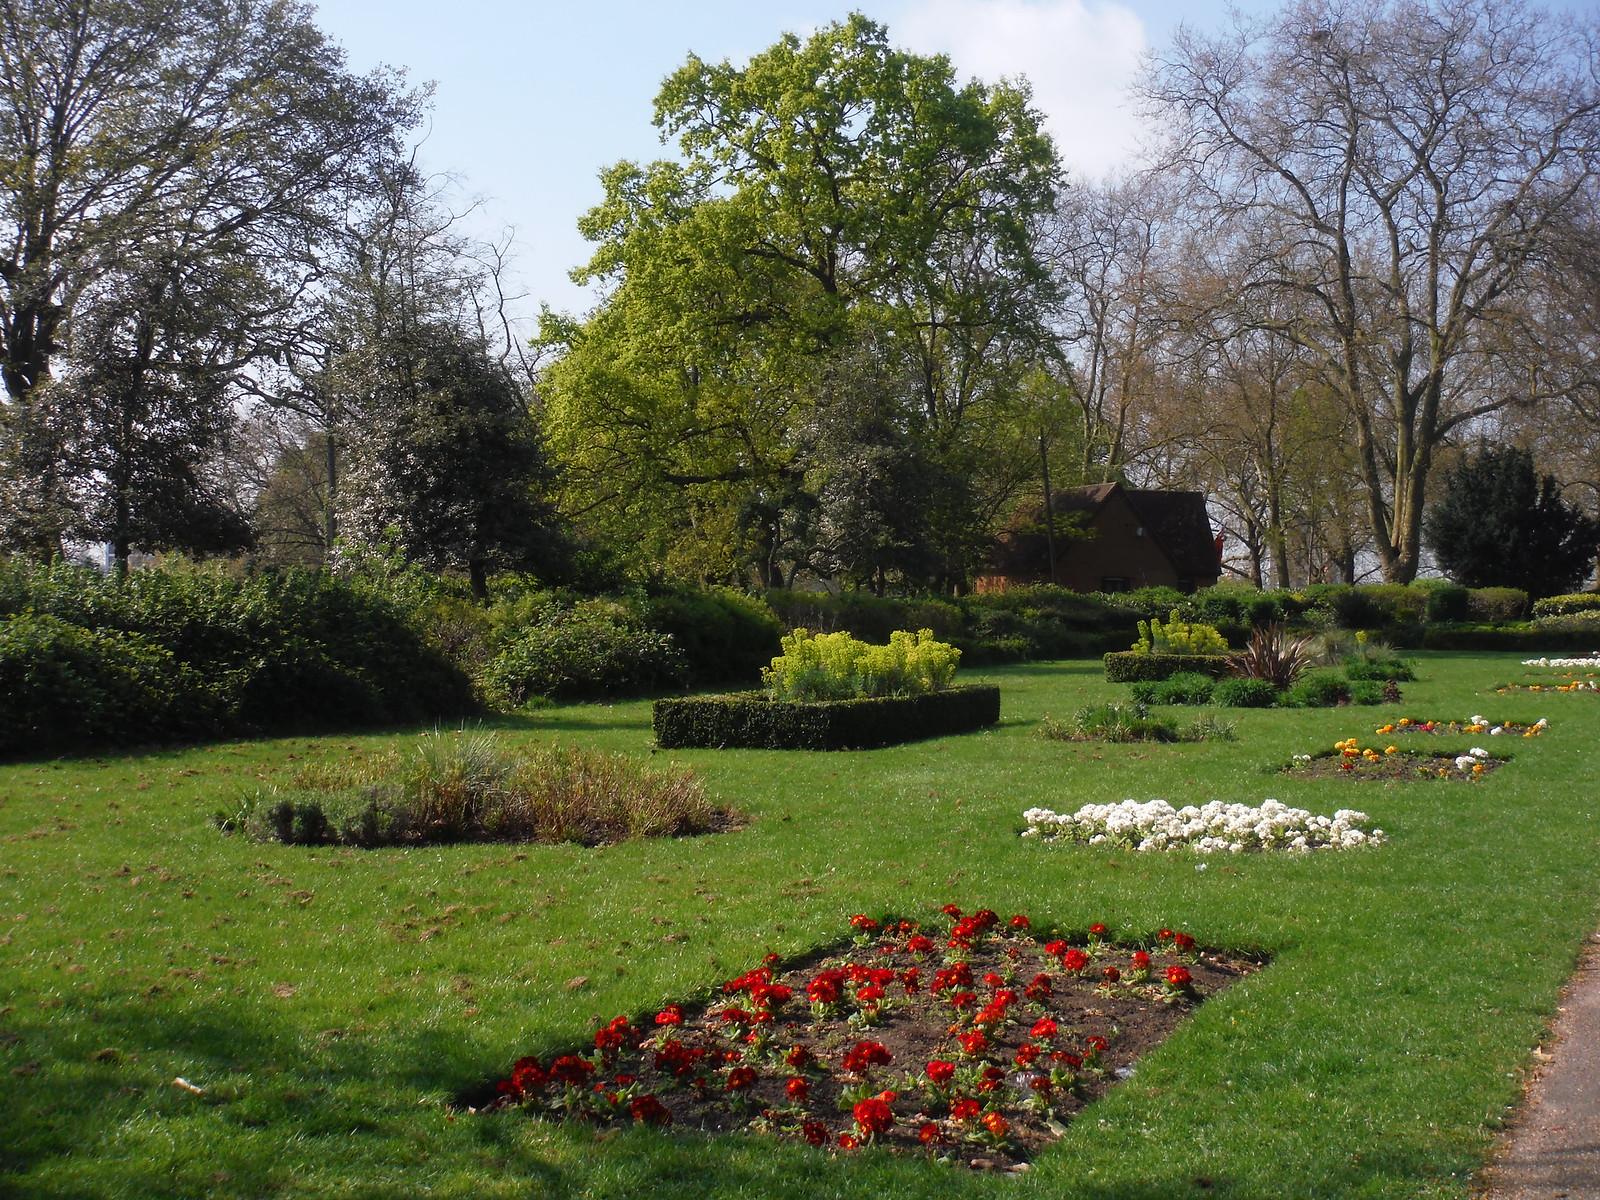 McKenzie Flower Garden, Finsbury Park SWC Short Walk 26 - Woodberry Wetlands (Stoke Newington Reservoirs)